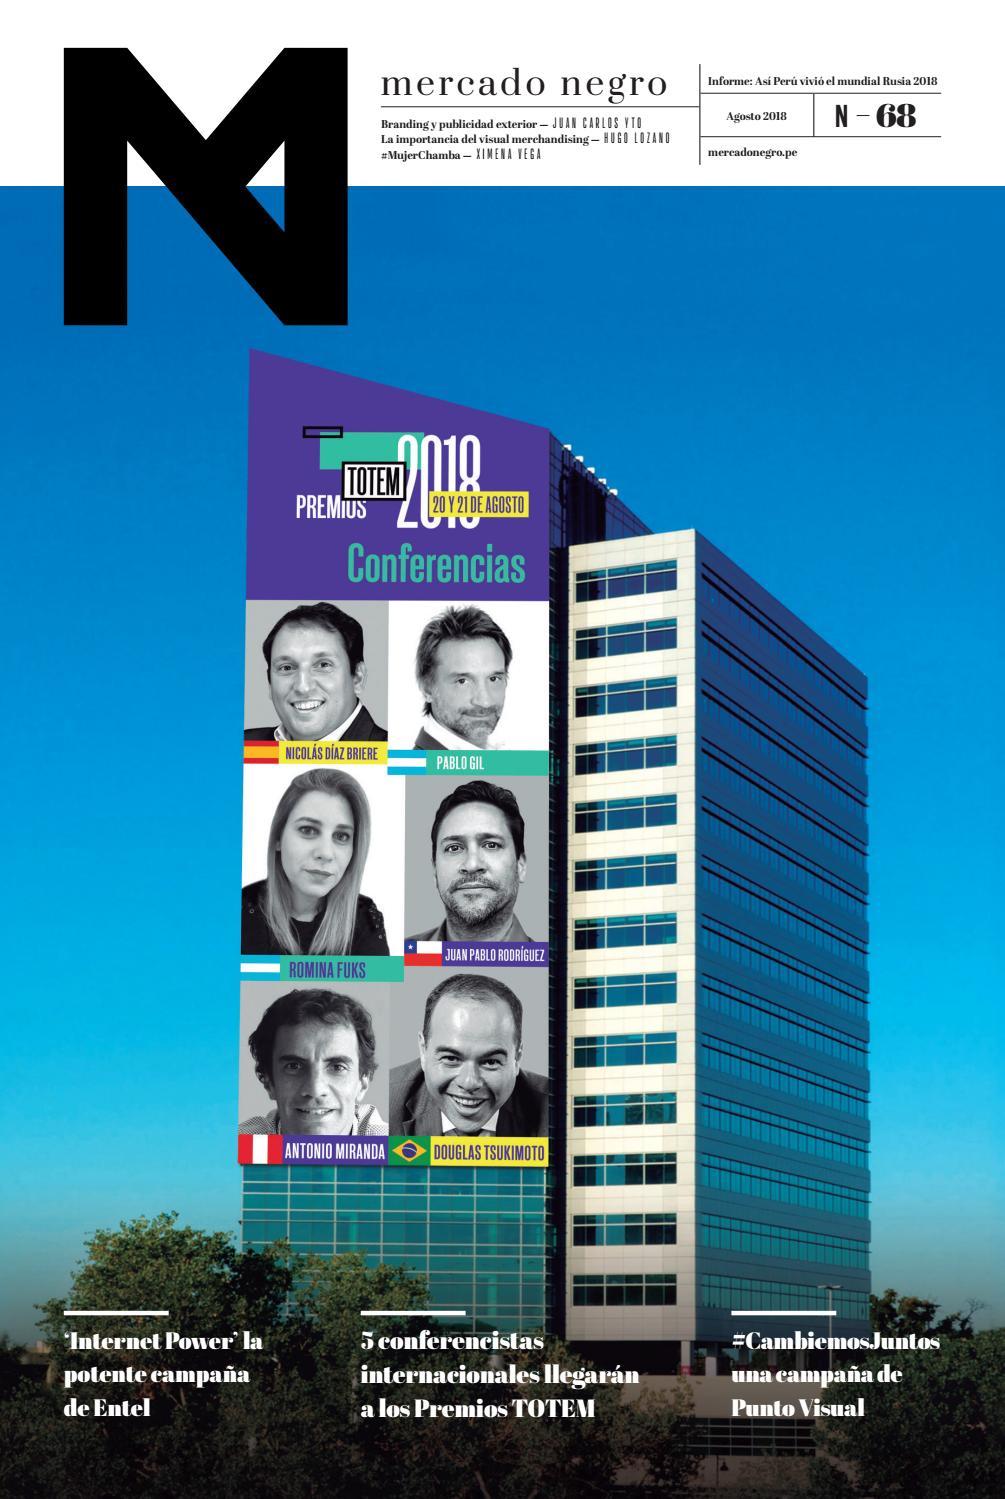 ADnews 68 - Agosto 2018 by Mercado Negro Advertising - issuu 7e266407e1801